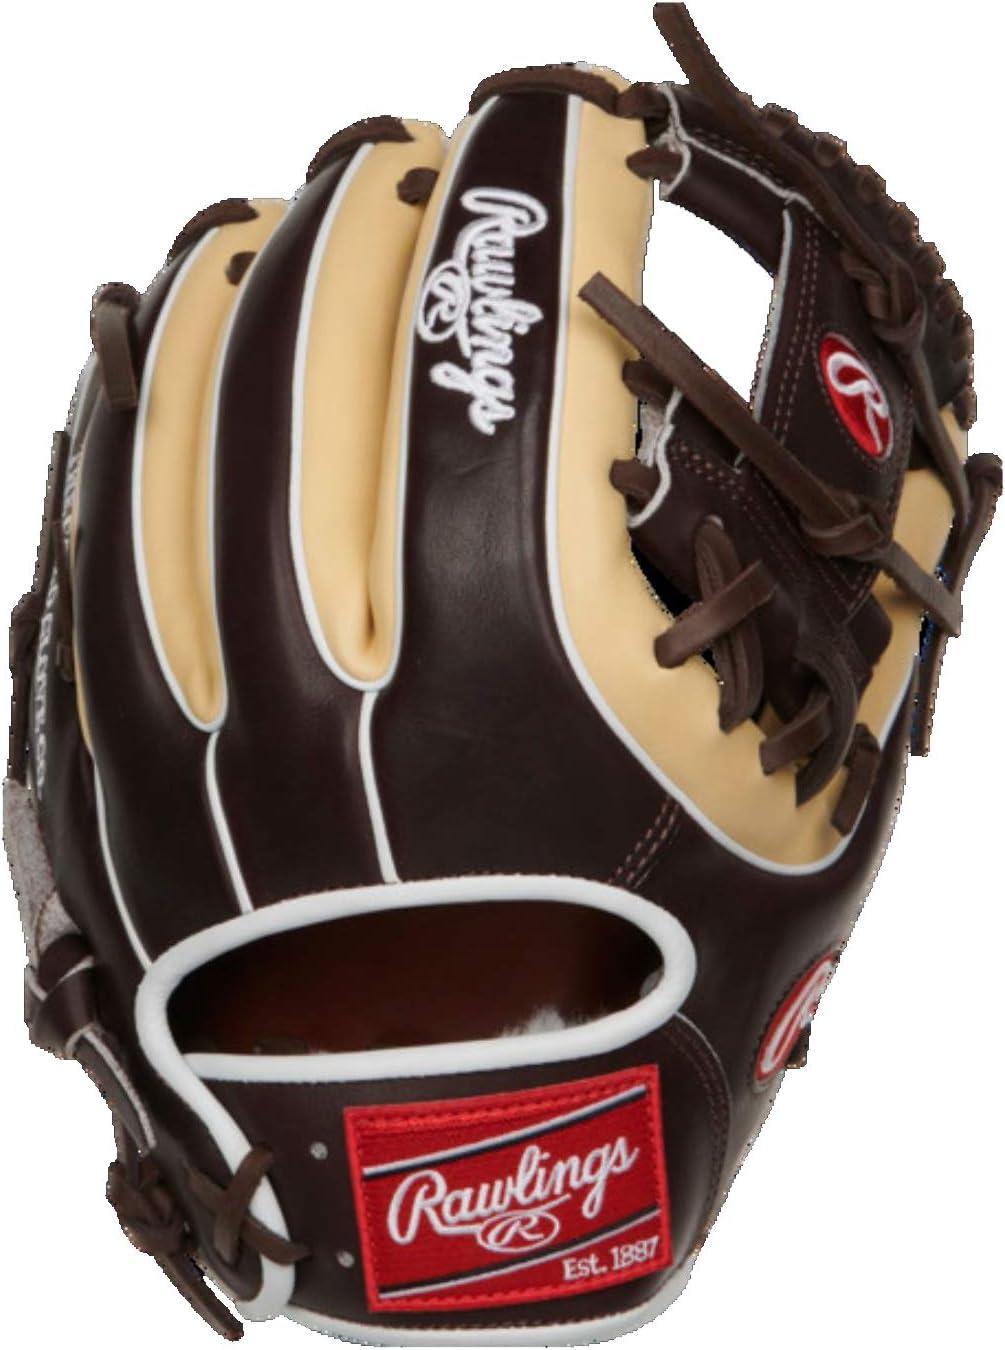 Rawlings Pro Preferred 11.75 Baseball Glove PROS315-2CMO PROS315-2CMO